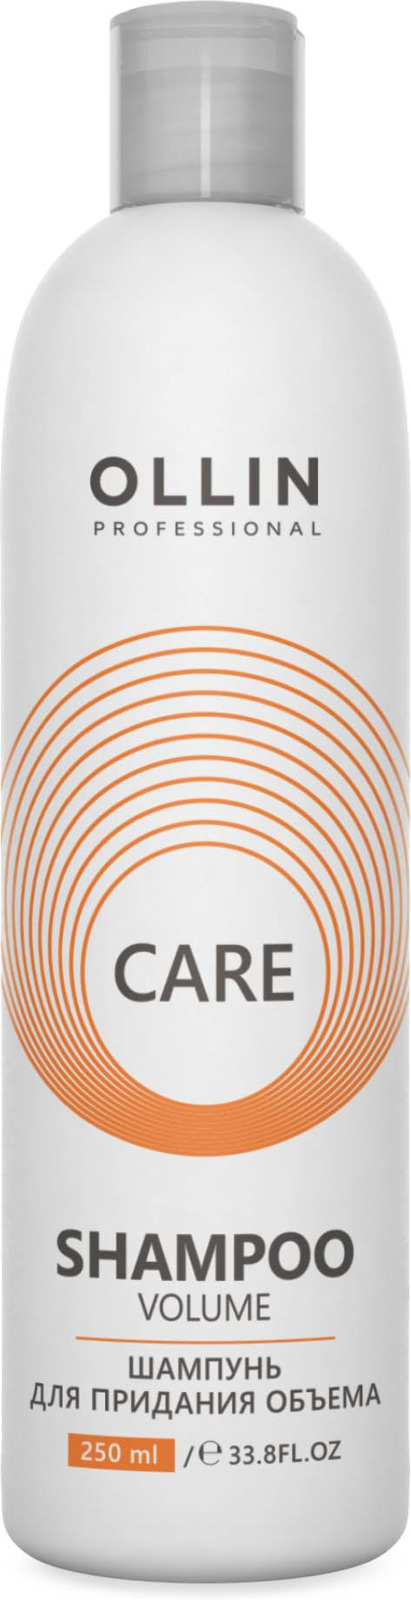 Ollin Шампунь для придания объема Care Volume Shampoo 250 мл ollin шампунь для придания объема ollin care volume shampoo 721432 1000 мл